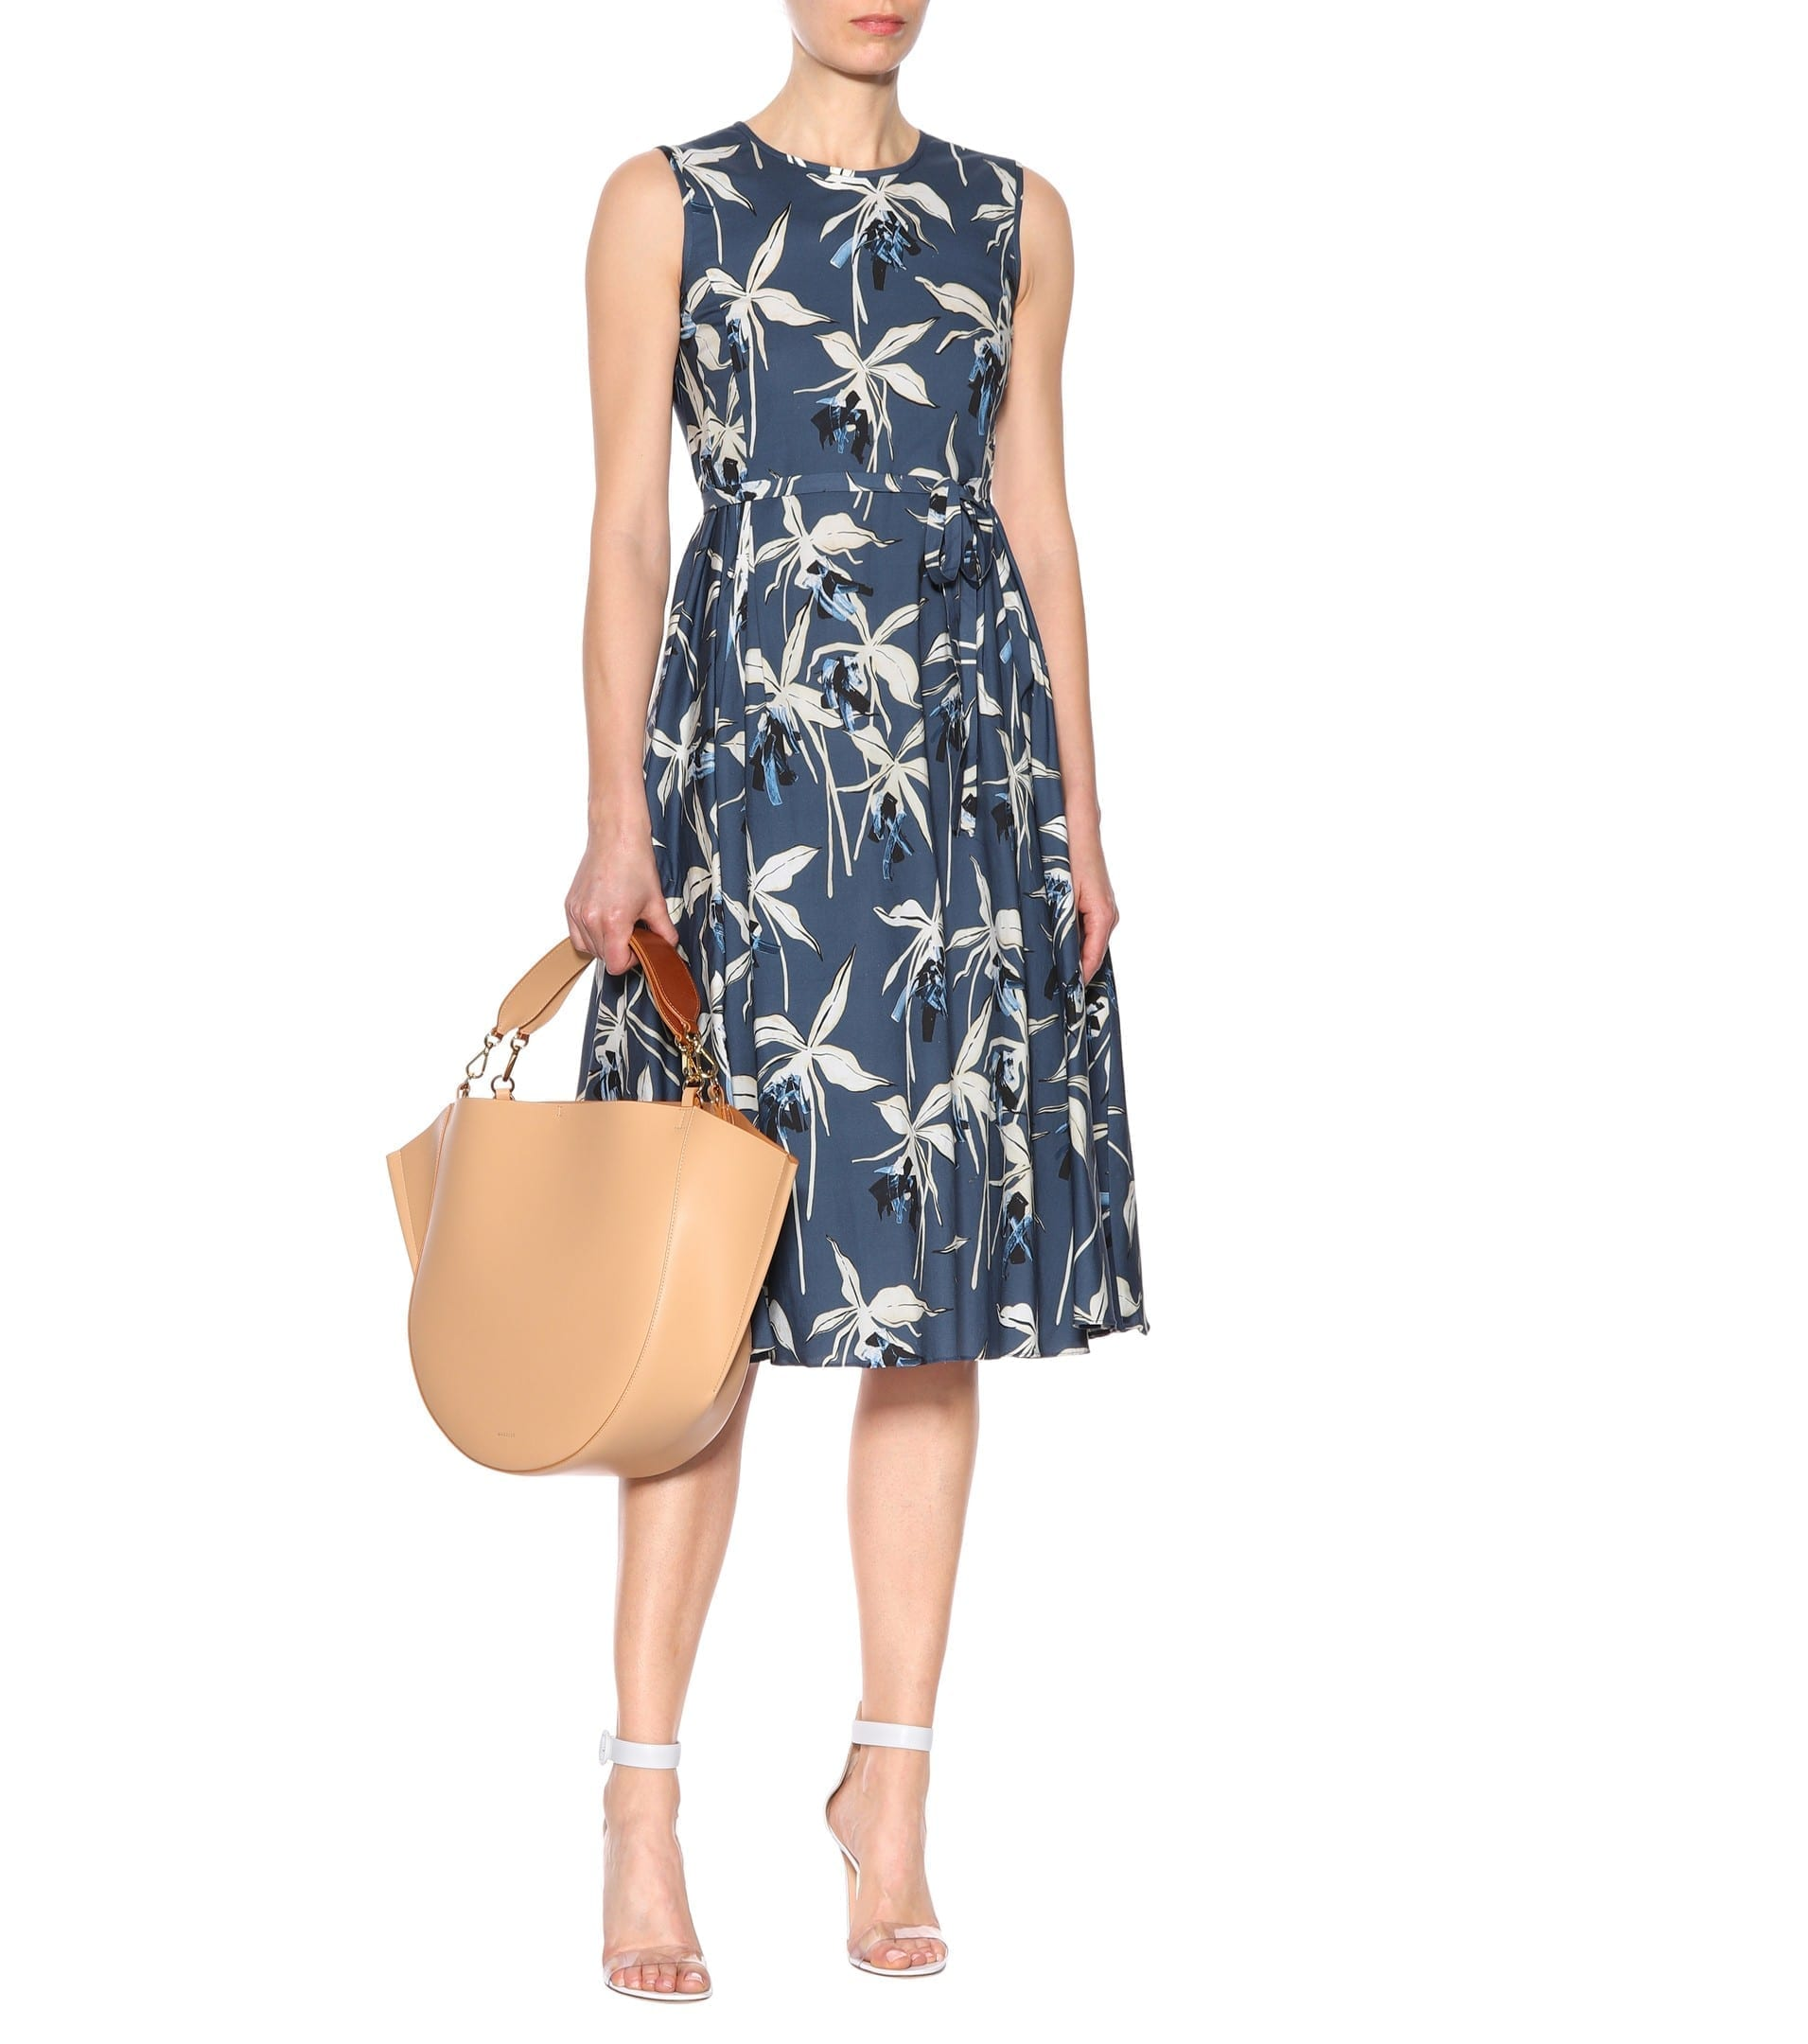 316c404f536 S MAX MARA Dilly Cotton Poplin Blue Dress - We Select Dresses